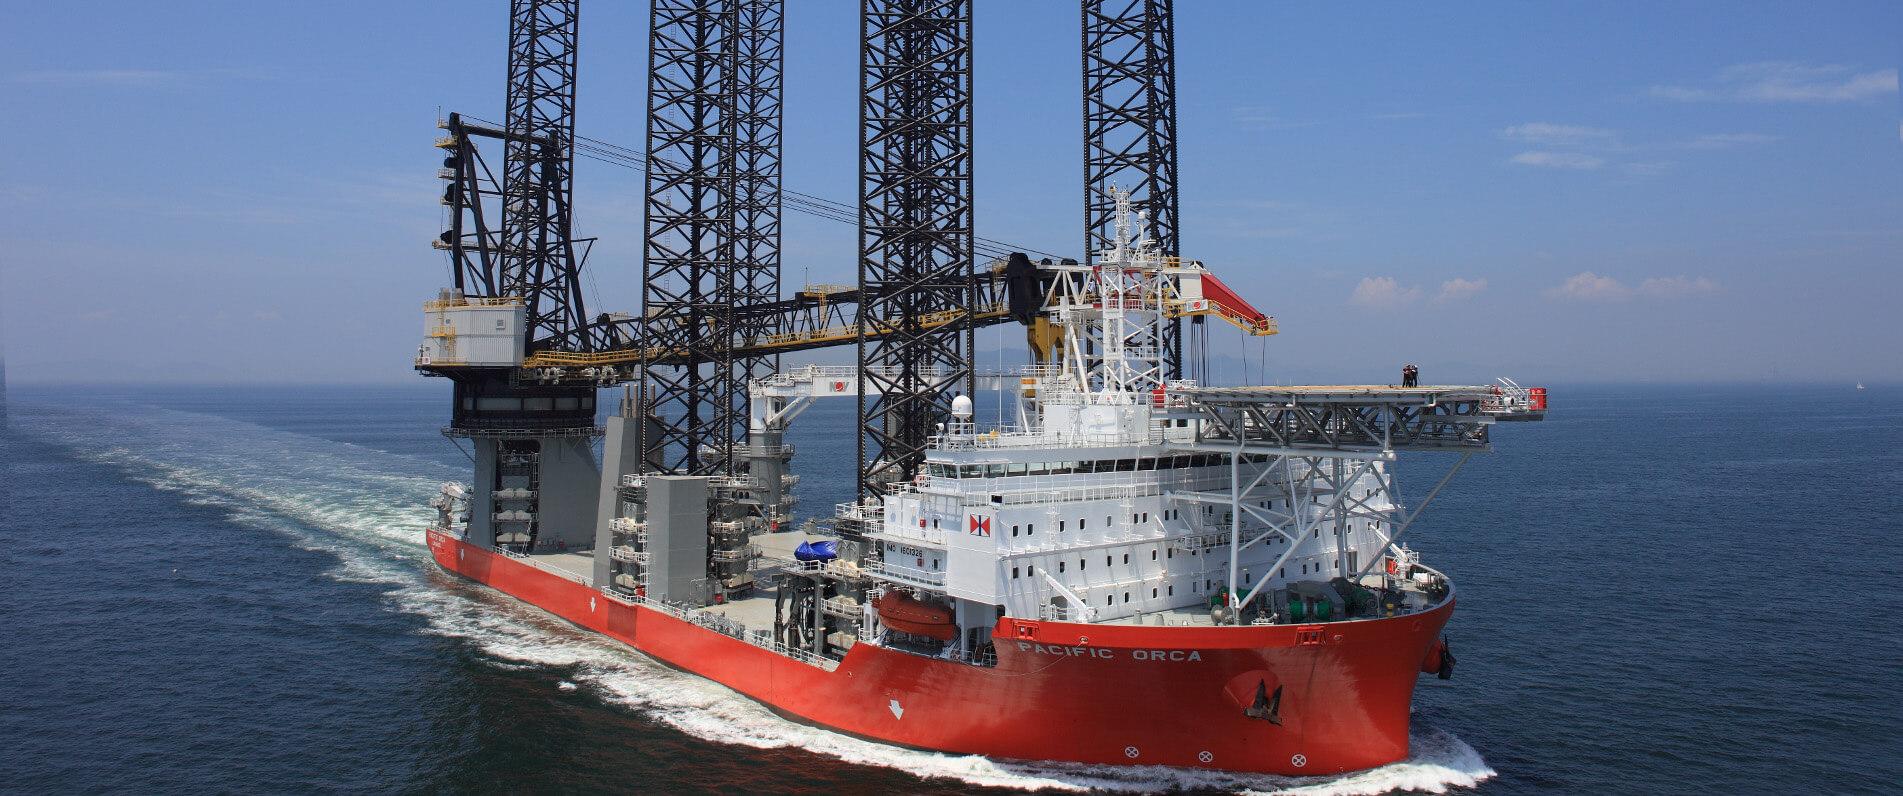 Design of Wind Turbine Installation Ships 'Pacific Orca' & 'Pacific